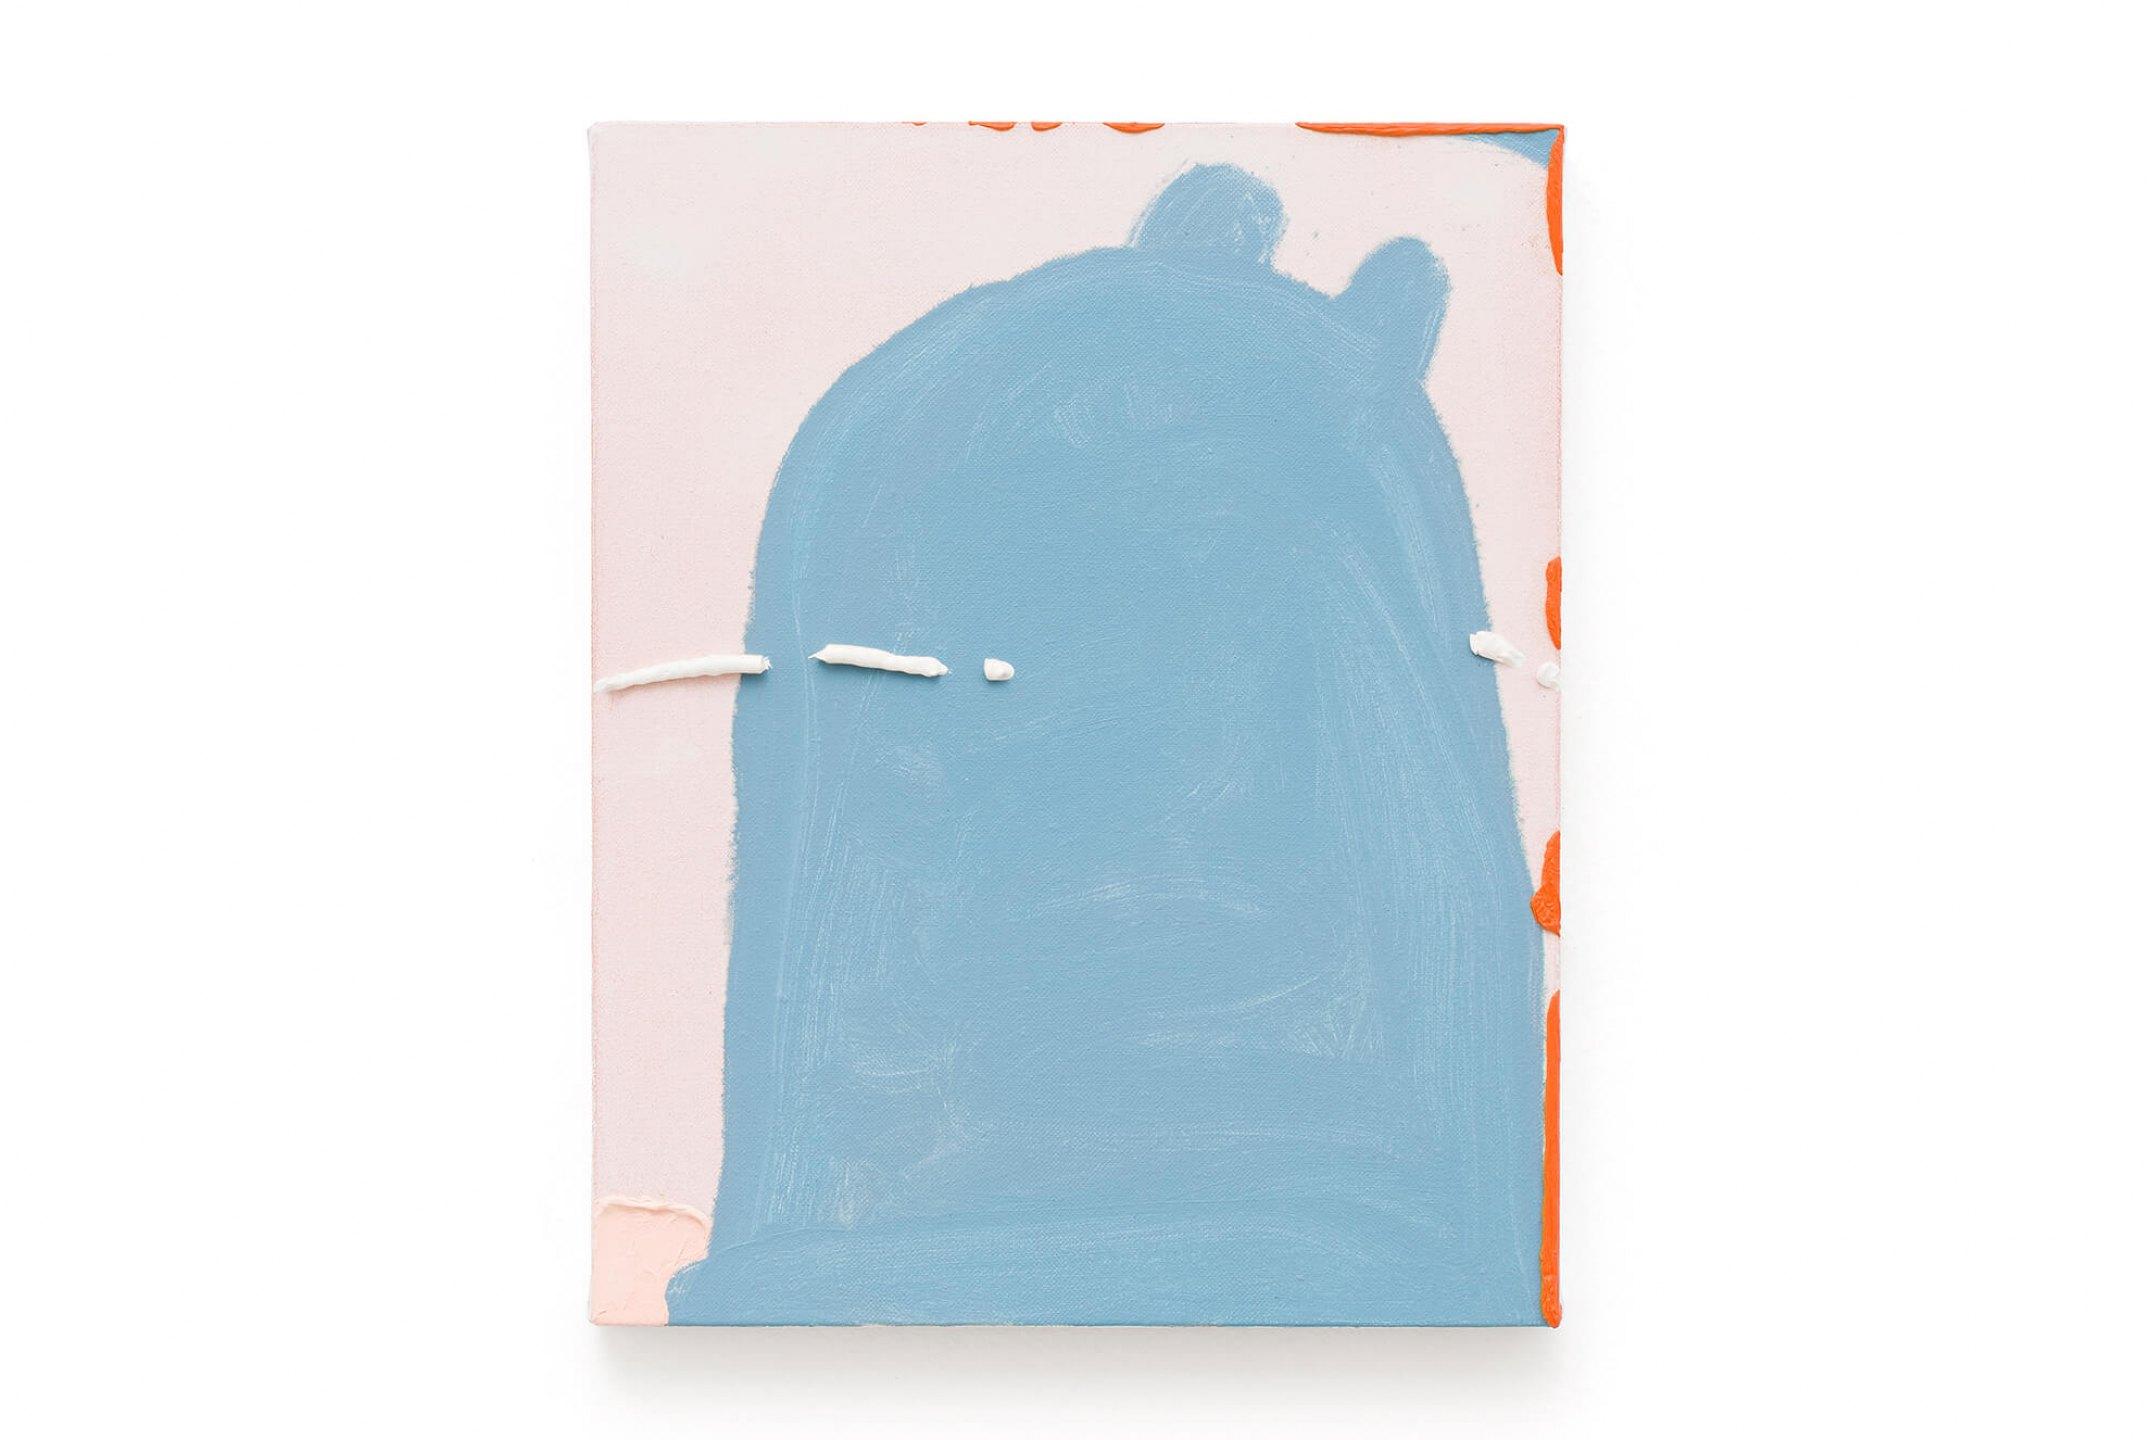 Paulo Monteiro, <em>untitled</em>, 2014, oil on canvas, 36 × 29 cm - Mendes Wood DM